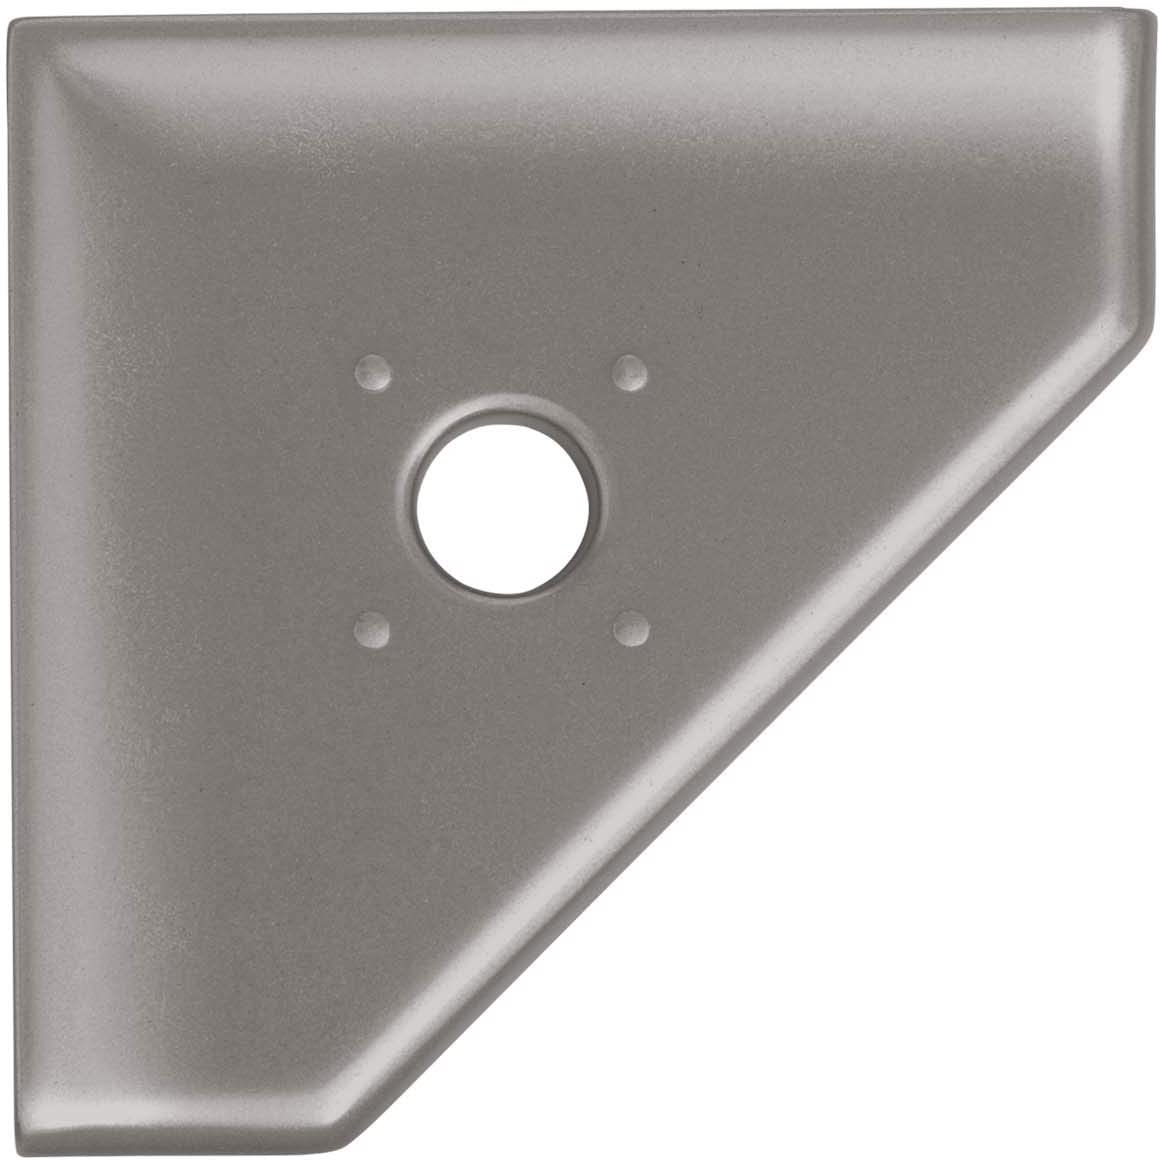 Miami Mall 5 inch Shower Caddy Sacramento Mall Soap Dish Cast Nickel - Corner Brushed Metal